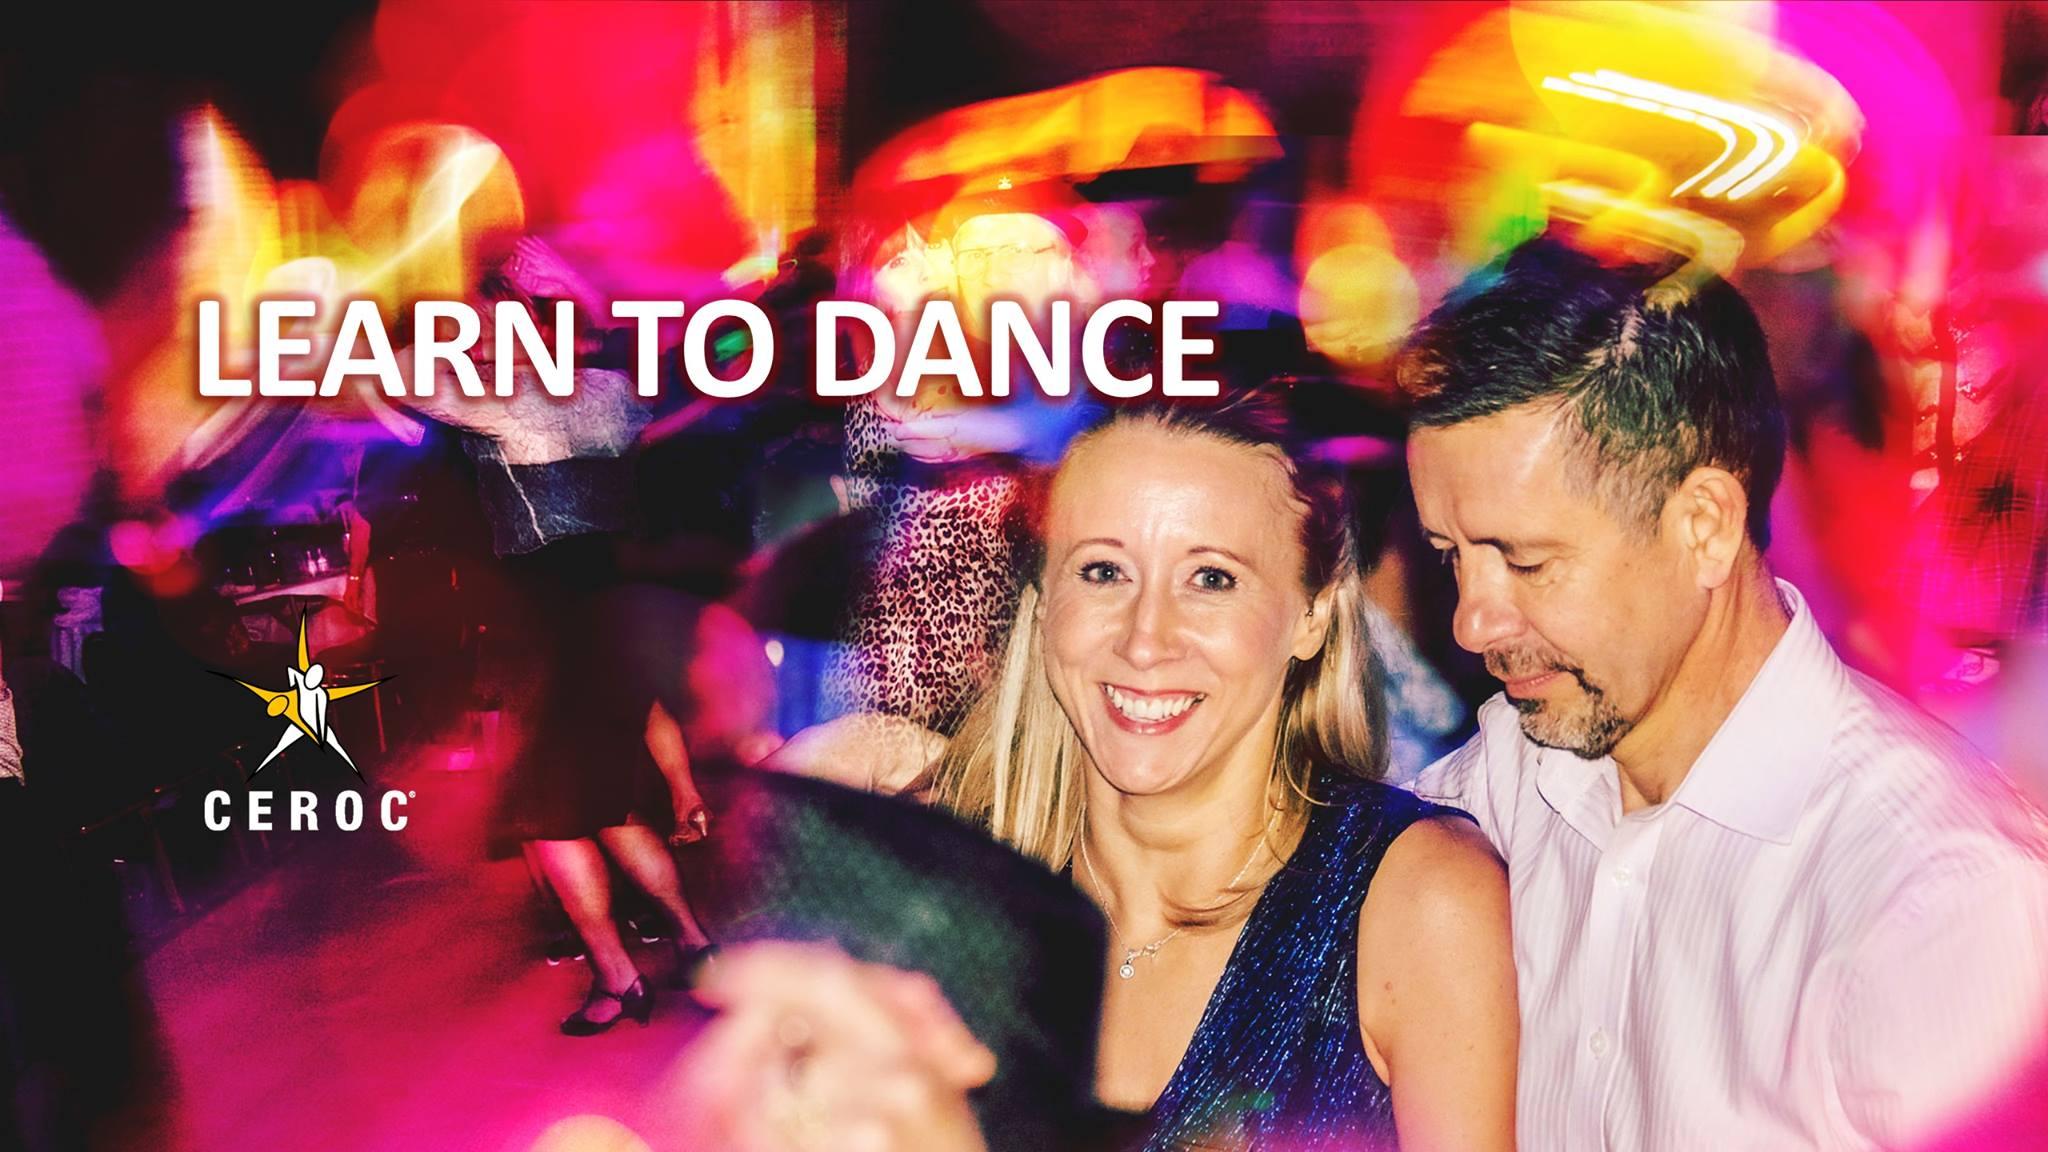 Learn to Dance Ceroc